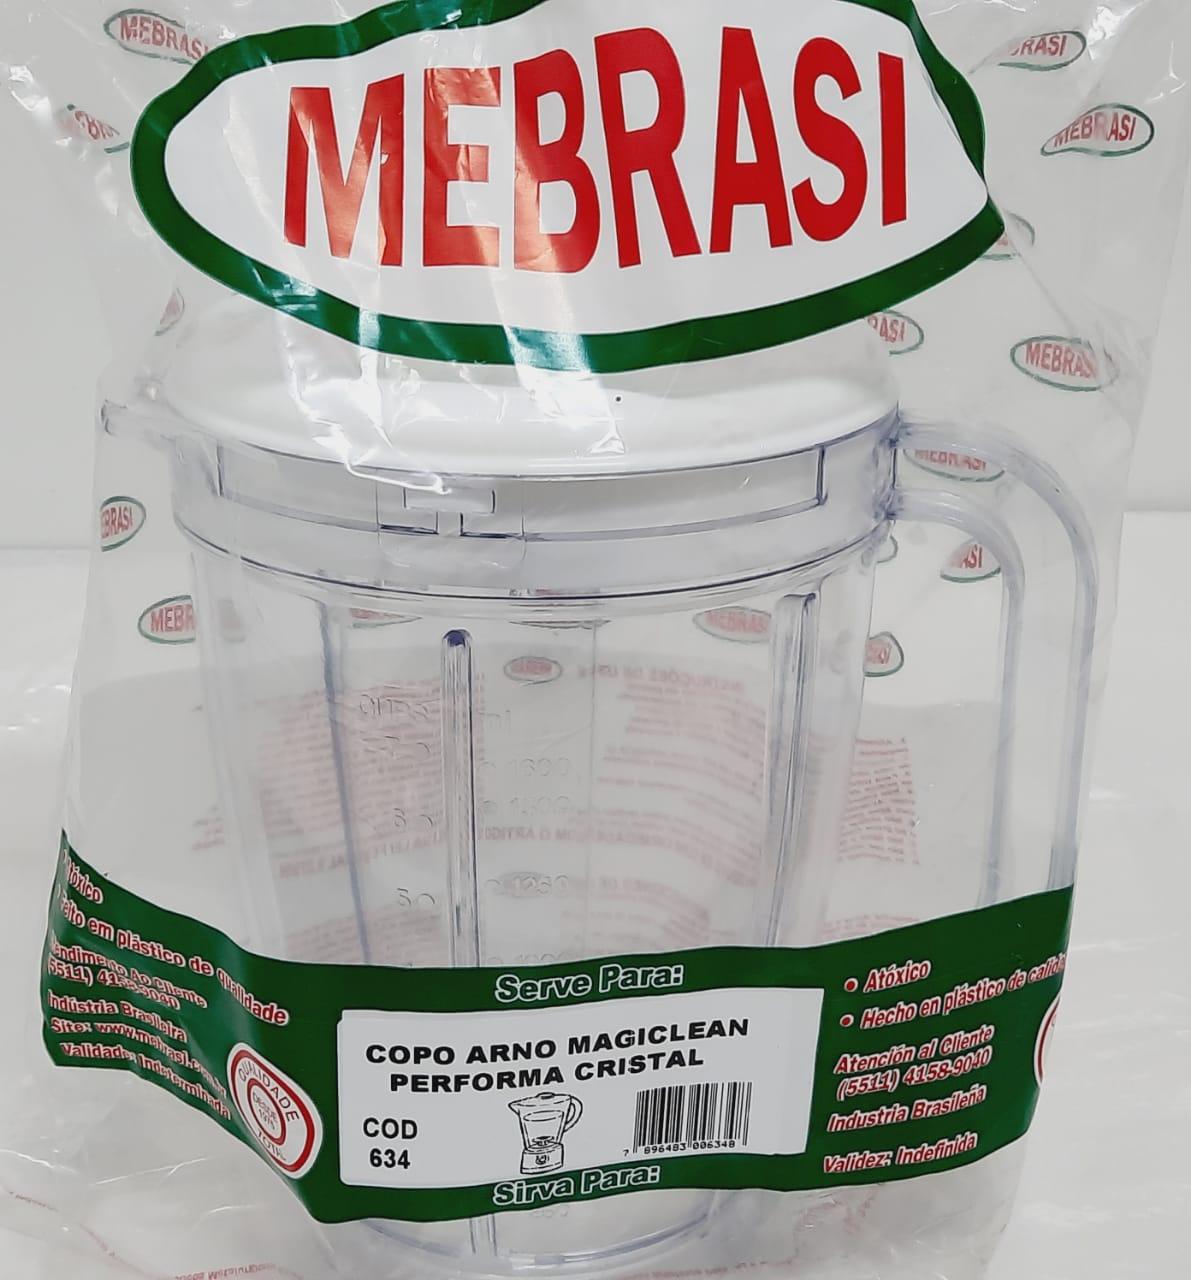 Copo Arno Cristal Magiclean Performa - Mebrasi